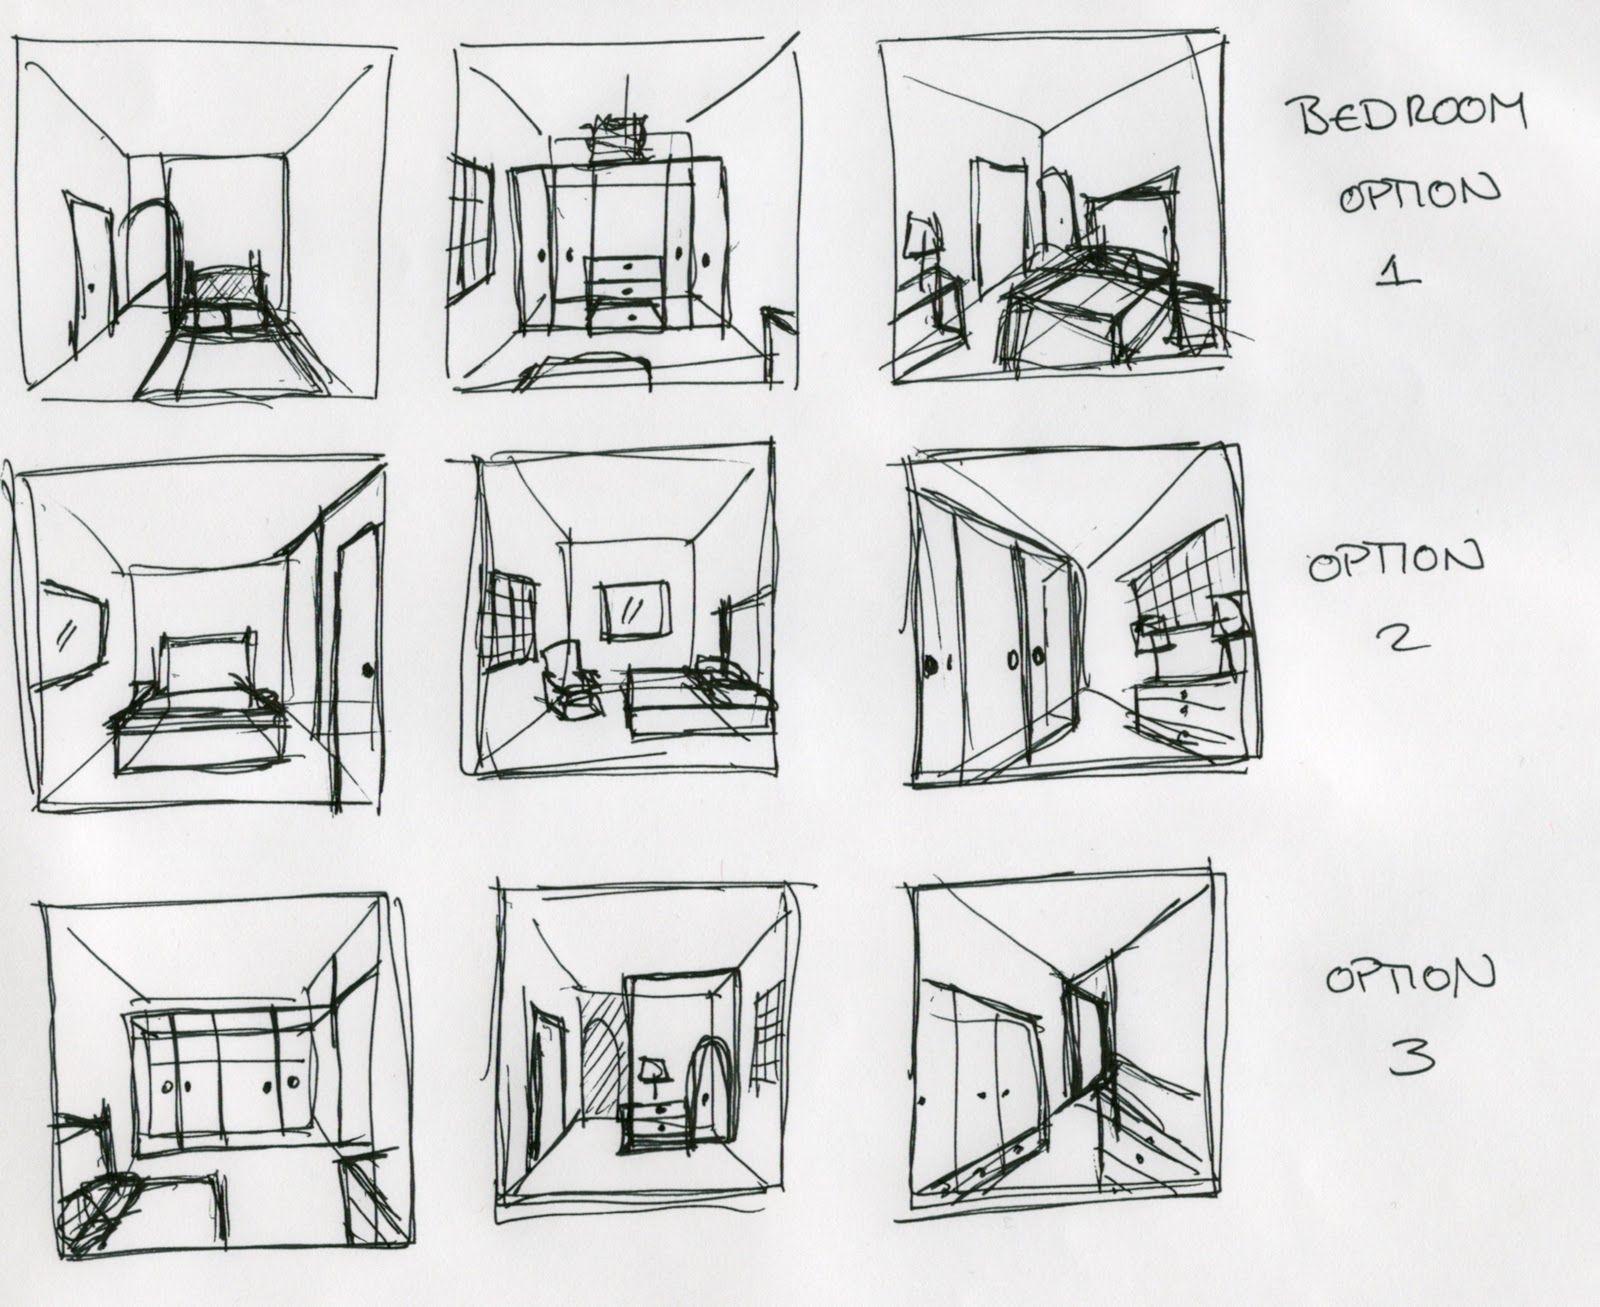 3d Thumbnail Sketches